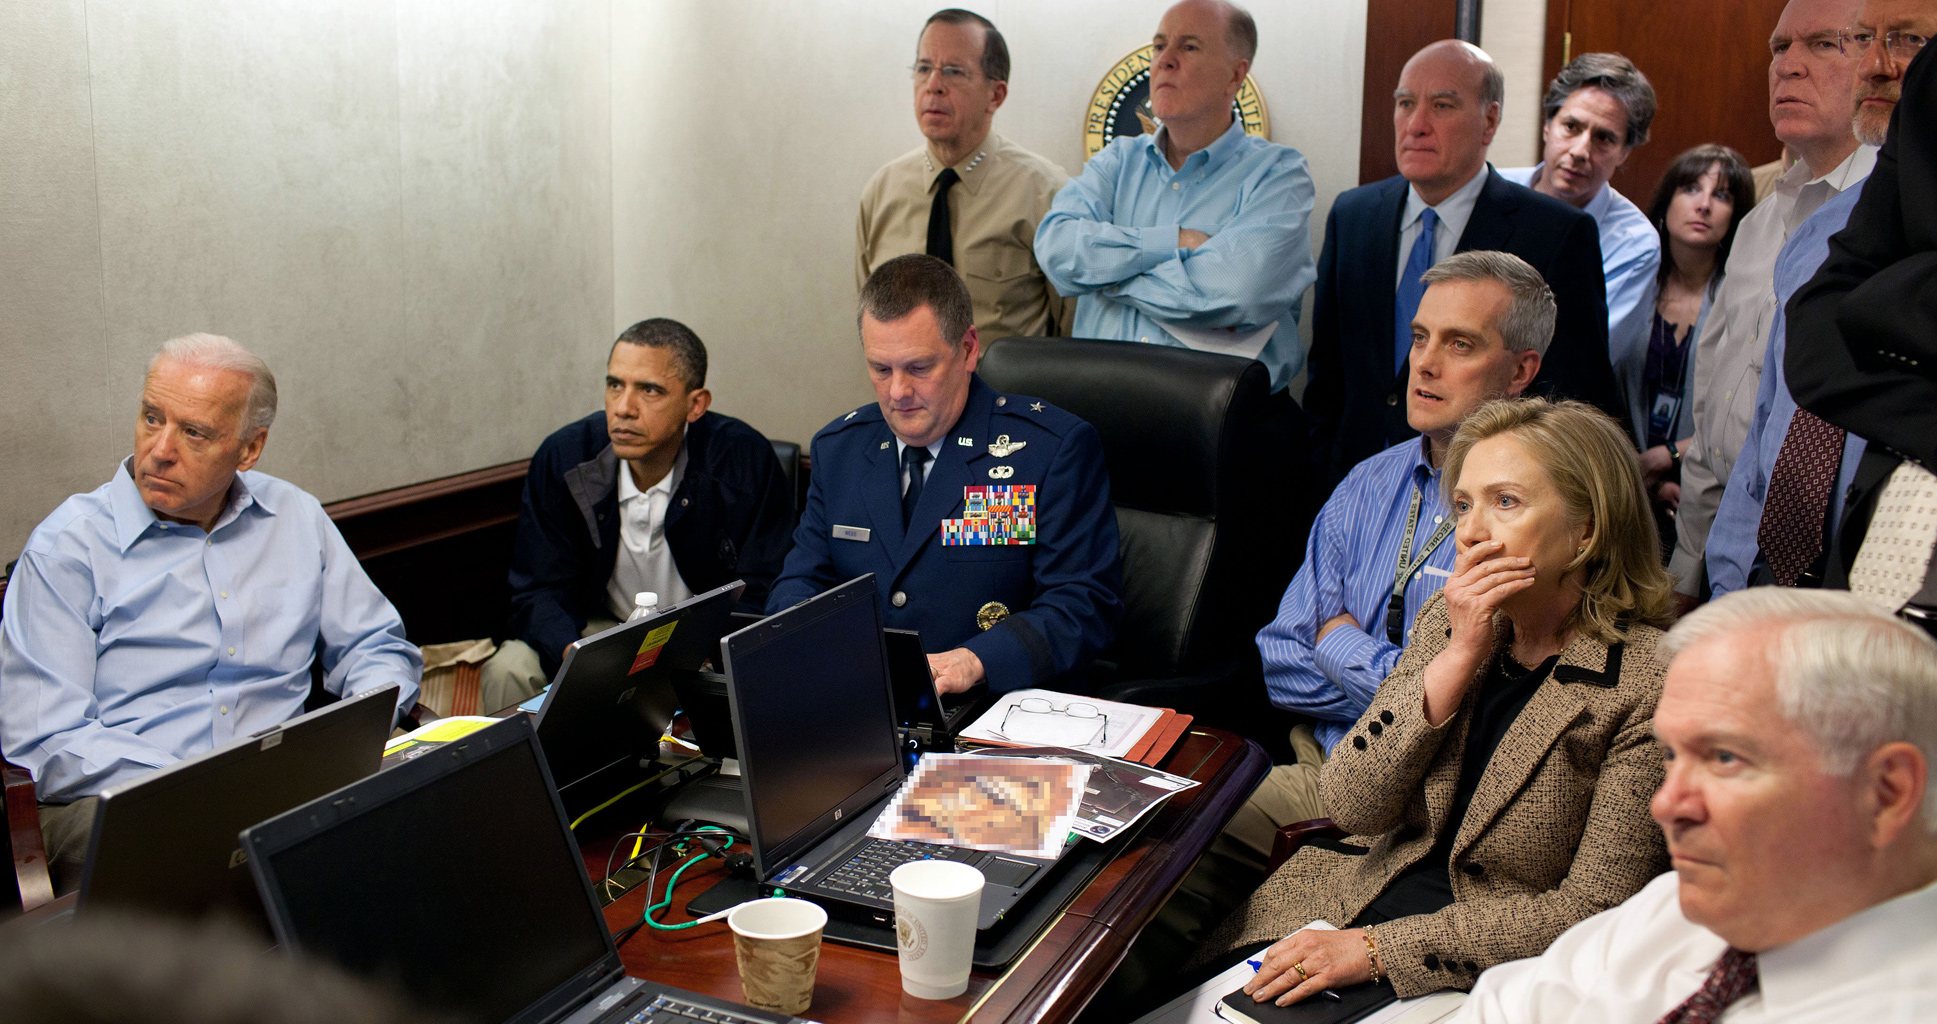 Les dernières heures de Ben Laden vues par la SEAL Team Six